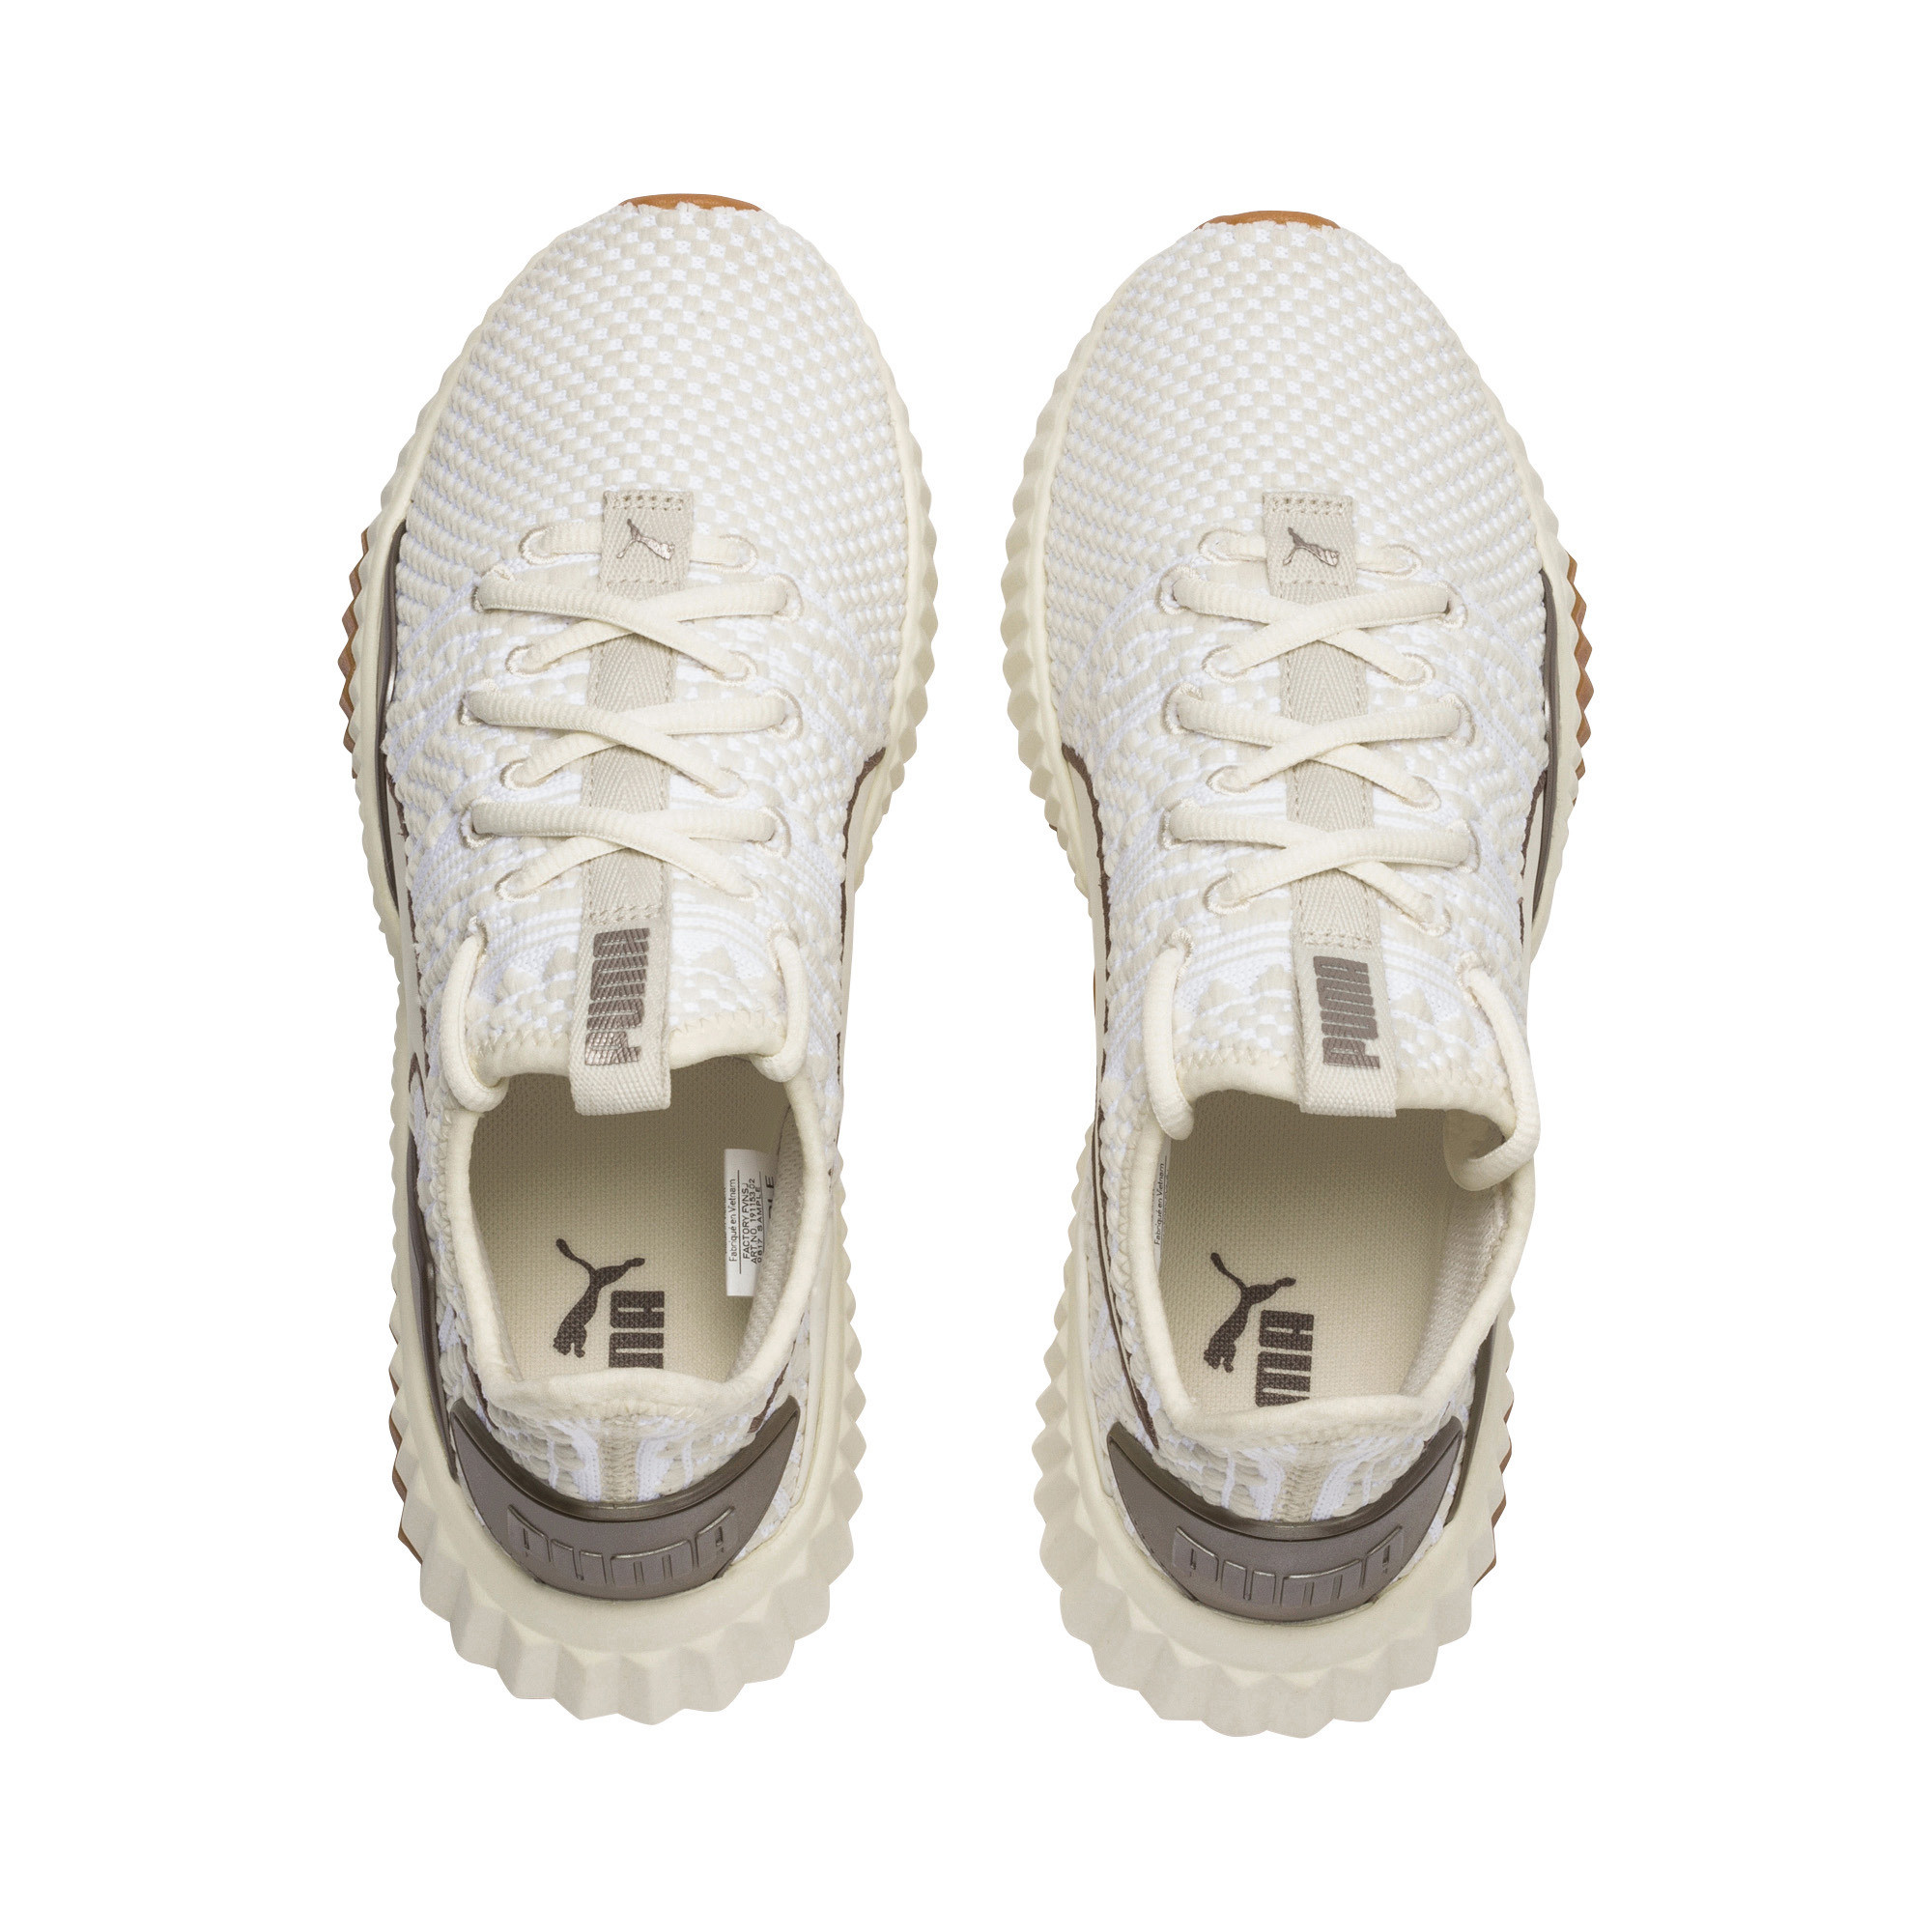 Image Puma Defy Luxe Women's Sneakers #6